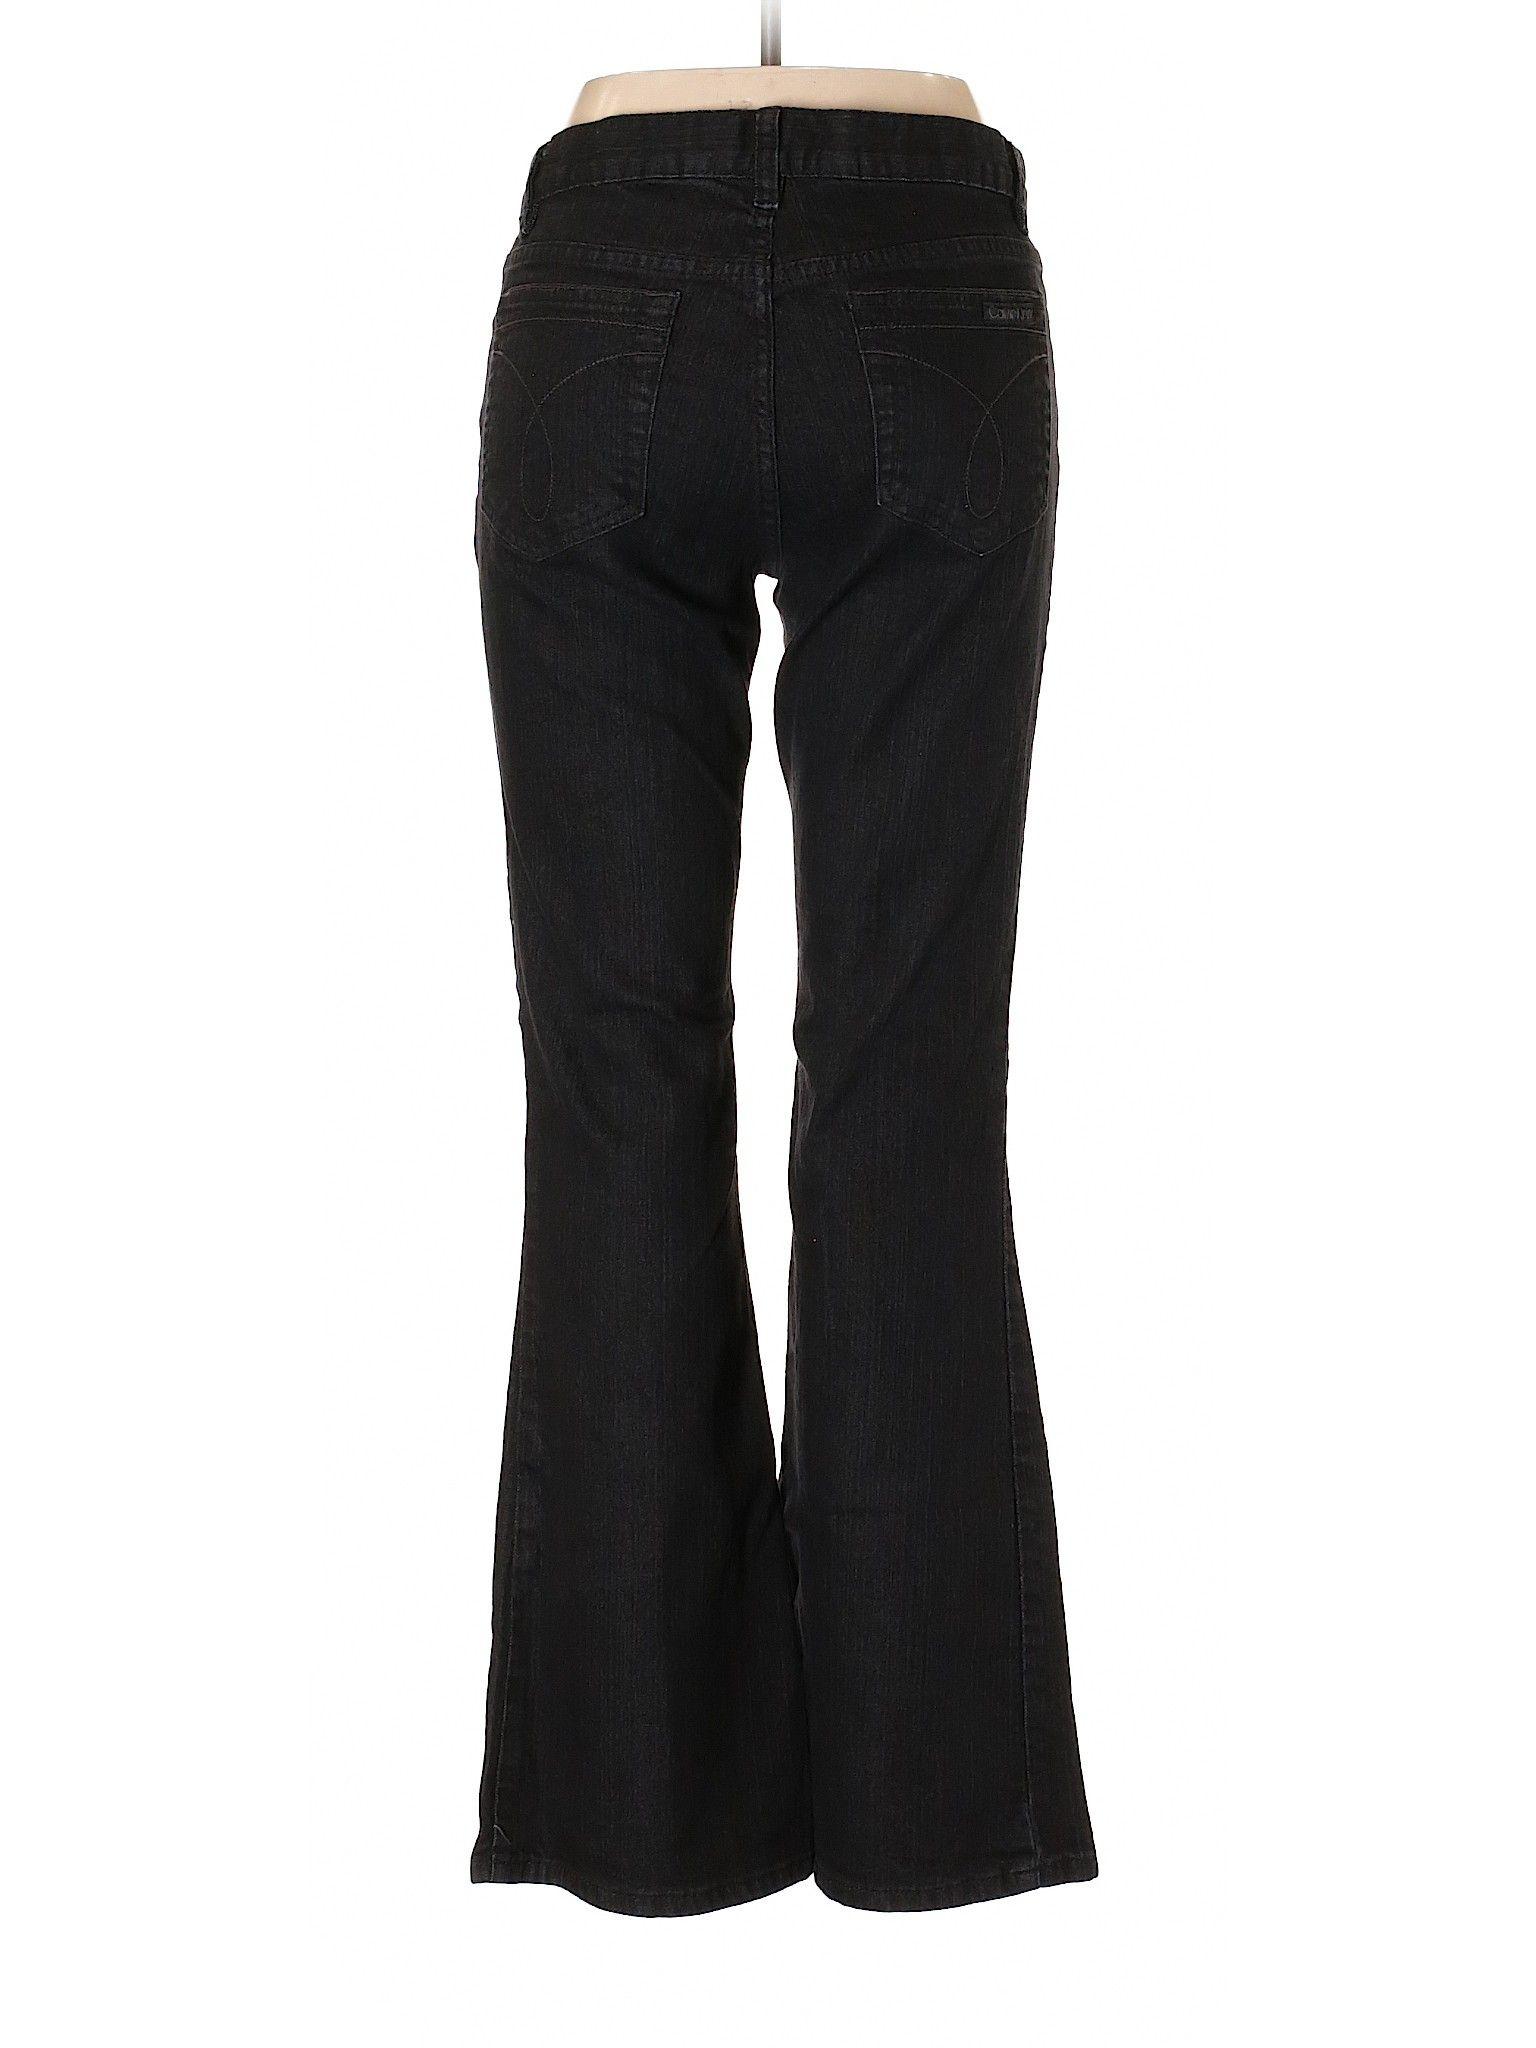 CALVIN KLEIN JEANS Jeans  Size 10.00 Black Women s Bottoms -  14.99 ... e19bcafa2a